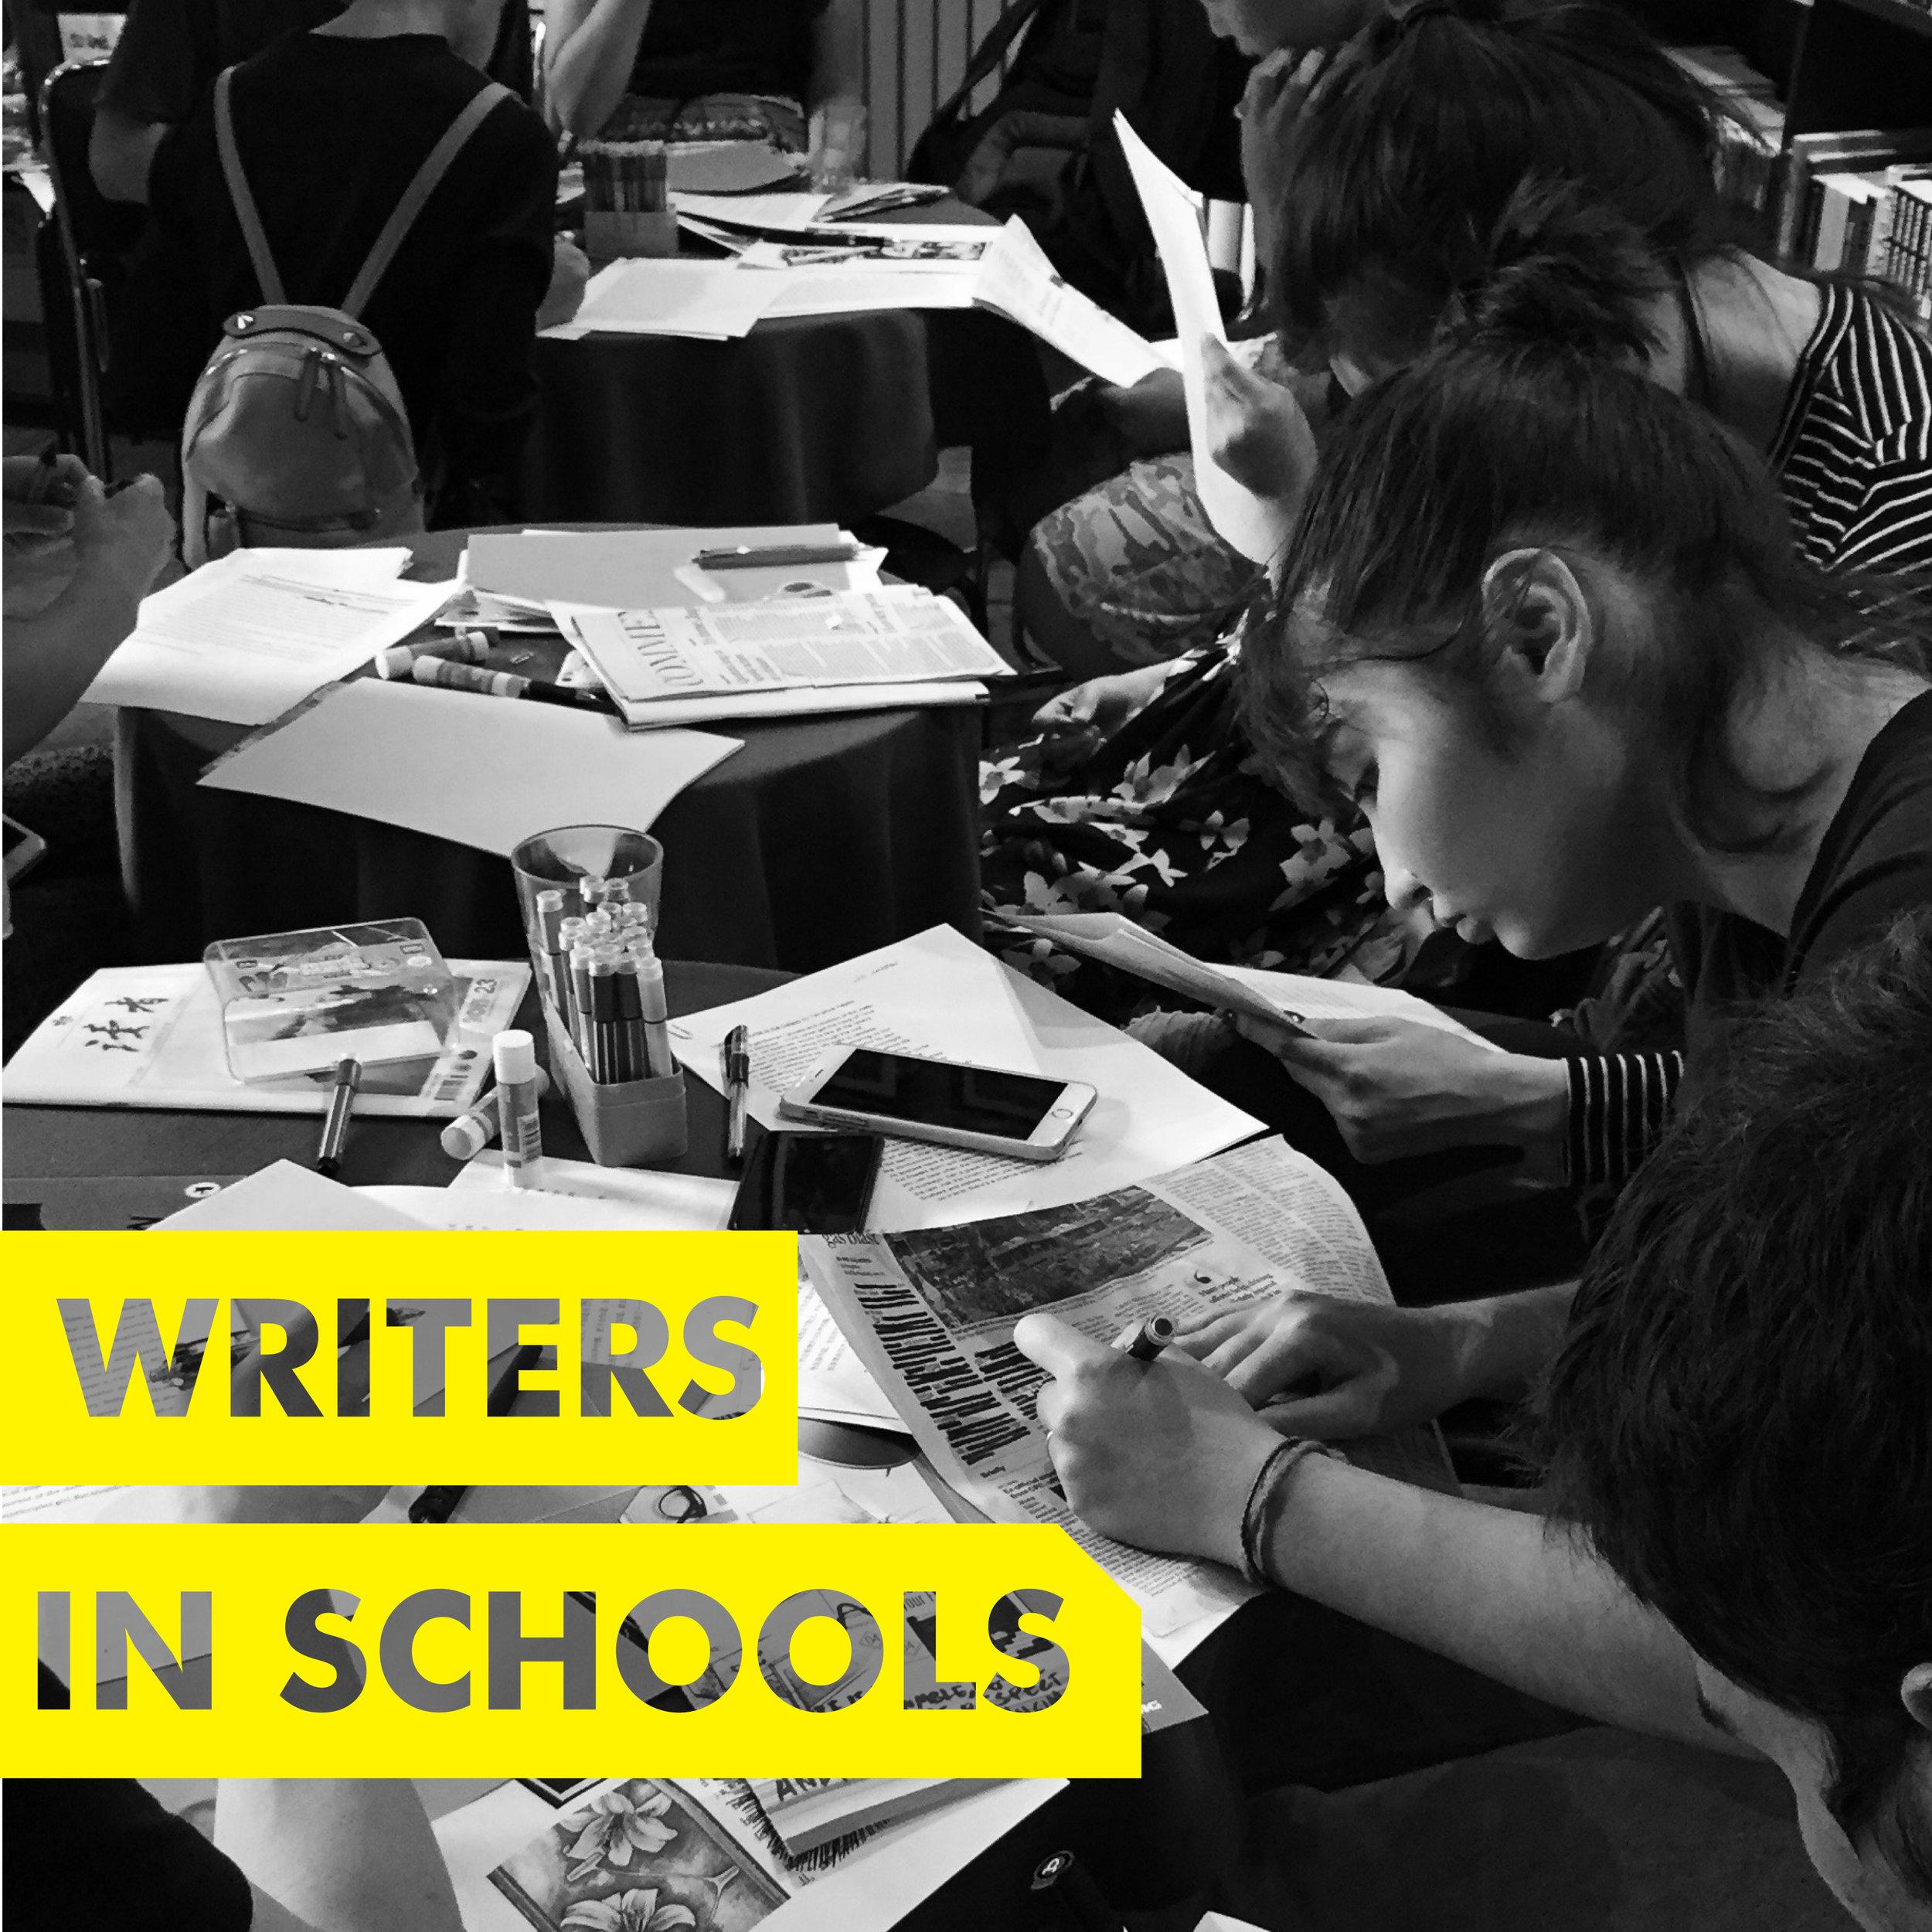 WRITERSSCHOOLS-05-04.jpg